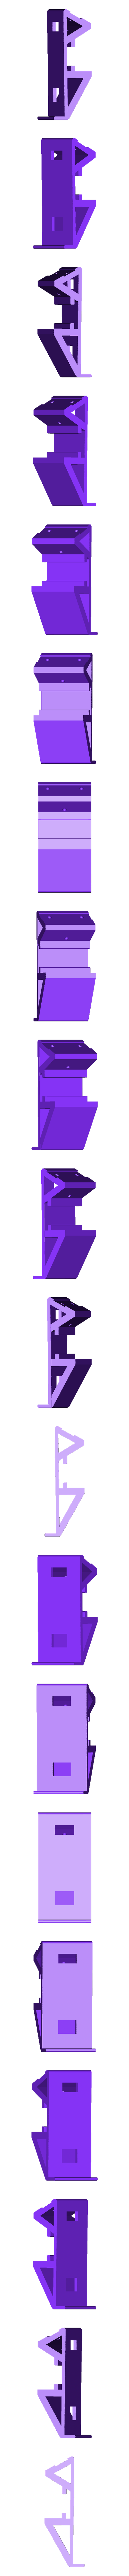 protection_lipo_V3_final_release.stl Télécharger fichier STL gratuit Protection lipo 30° V3 (Final Release) • Design pour imprimante 3D, Rhizamax